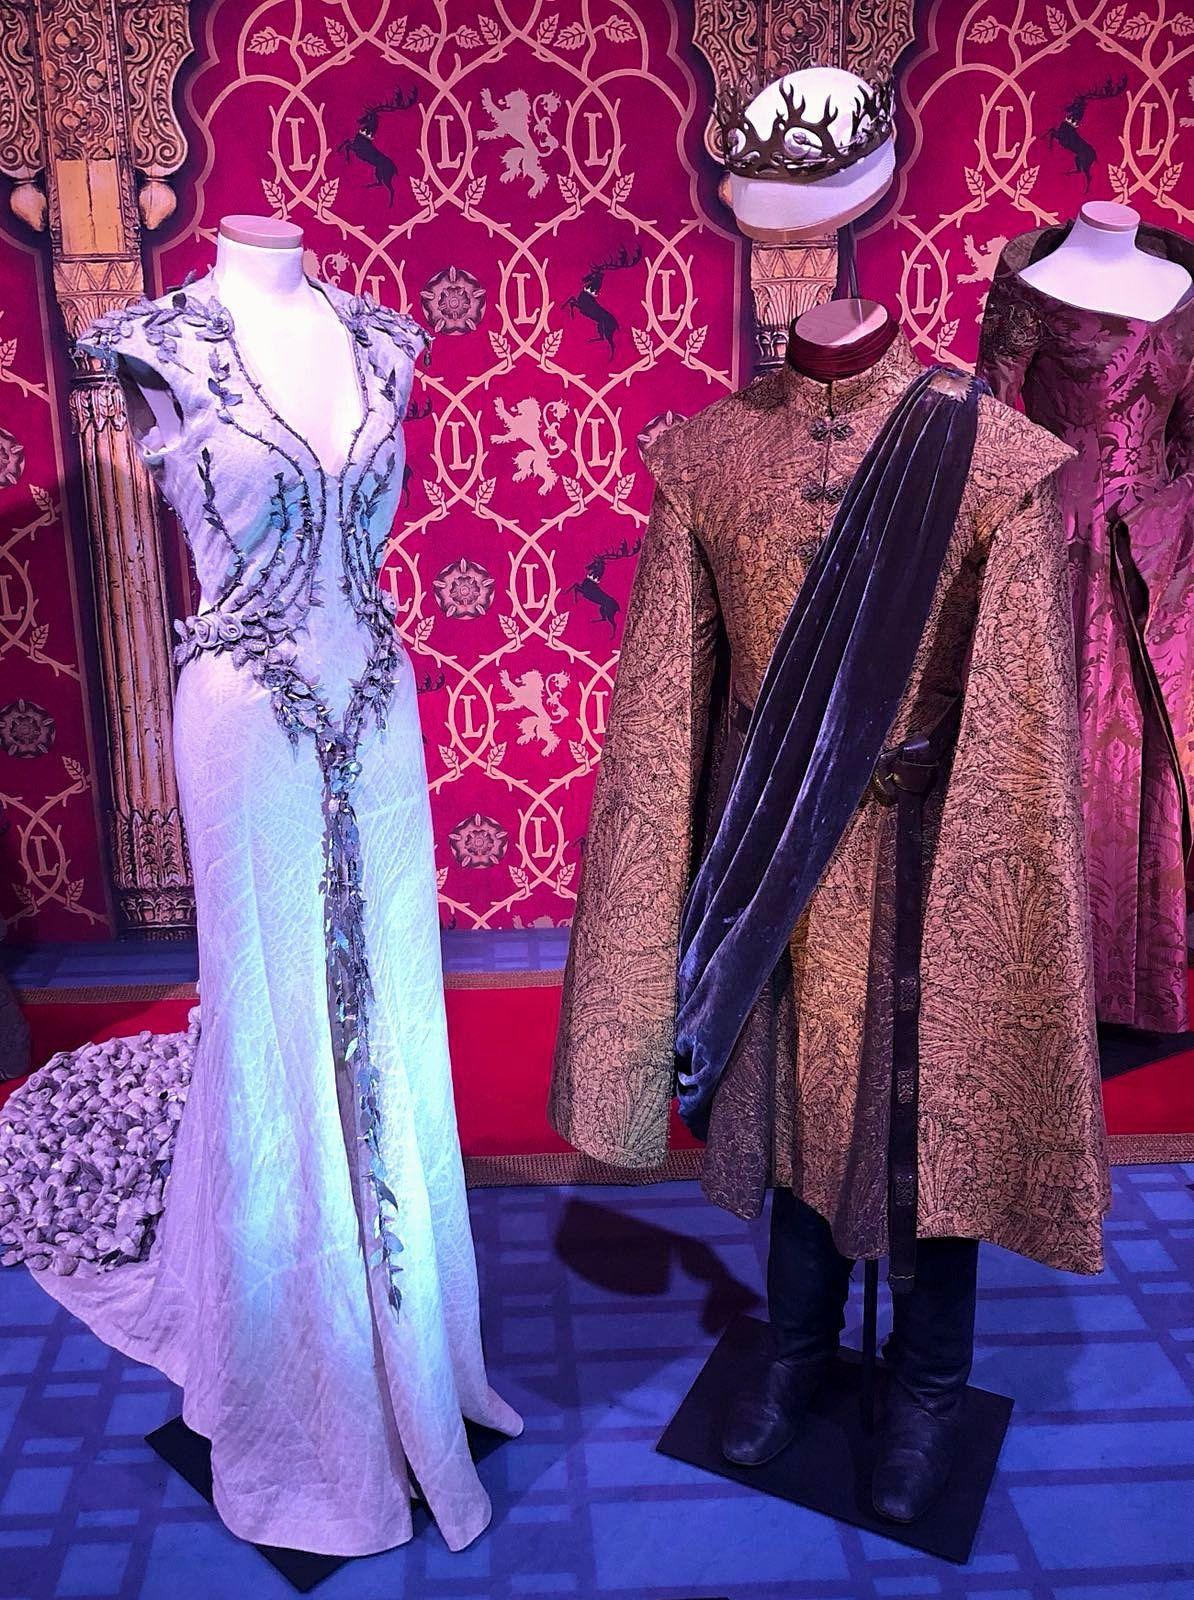 Journée parisienne... Exposition Game of Thrones